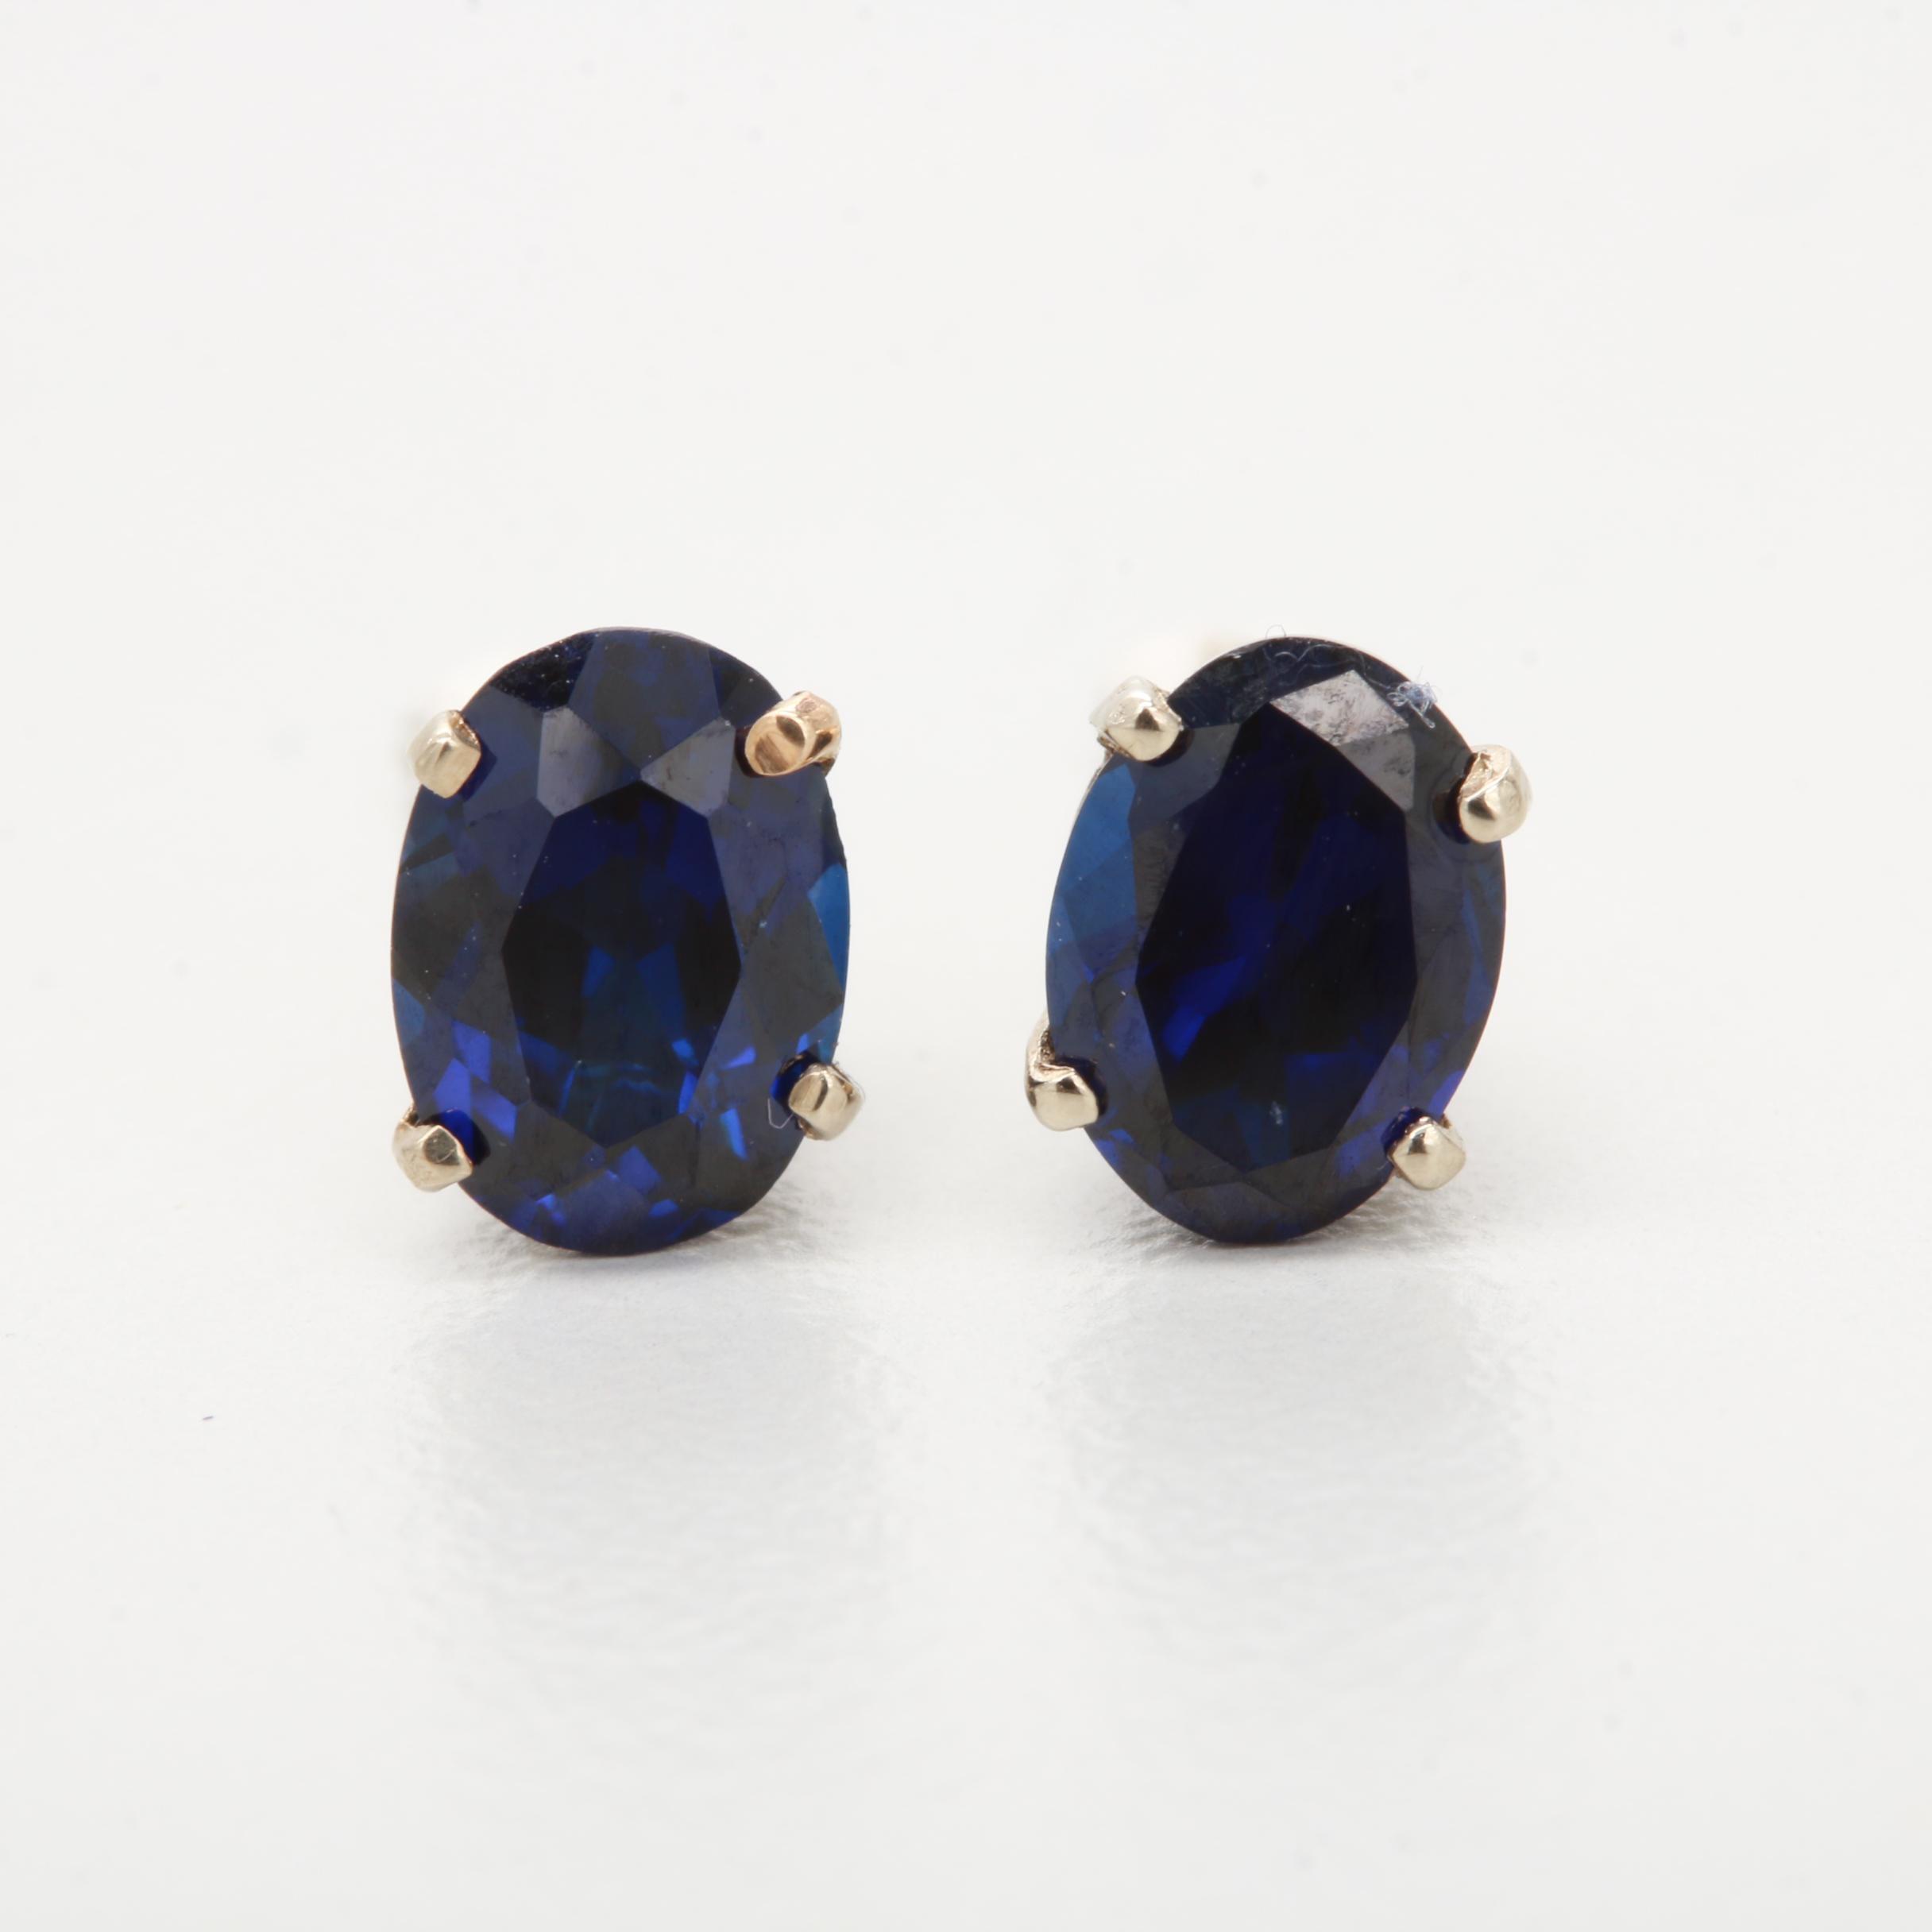 14K Yellow Gold Synthetic Sapphire Stud Earrings